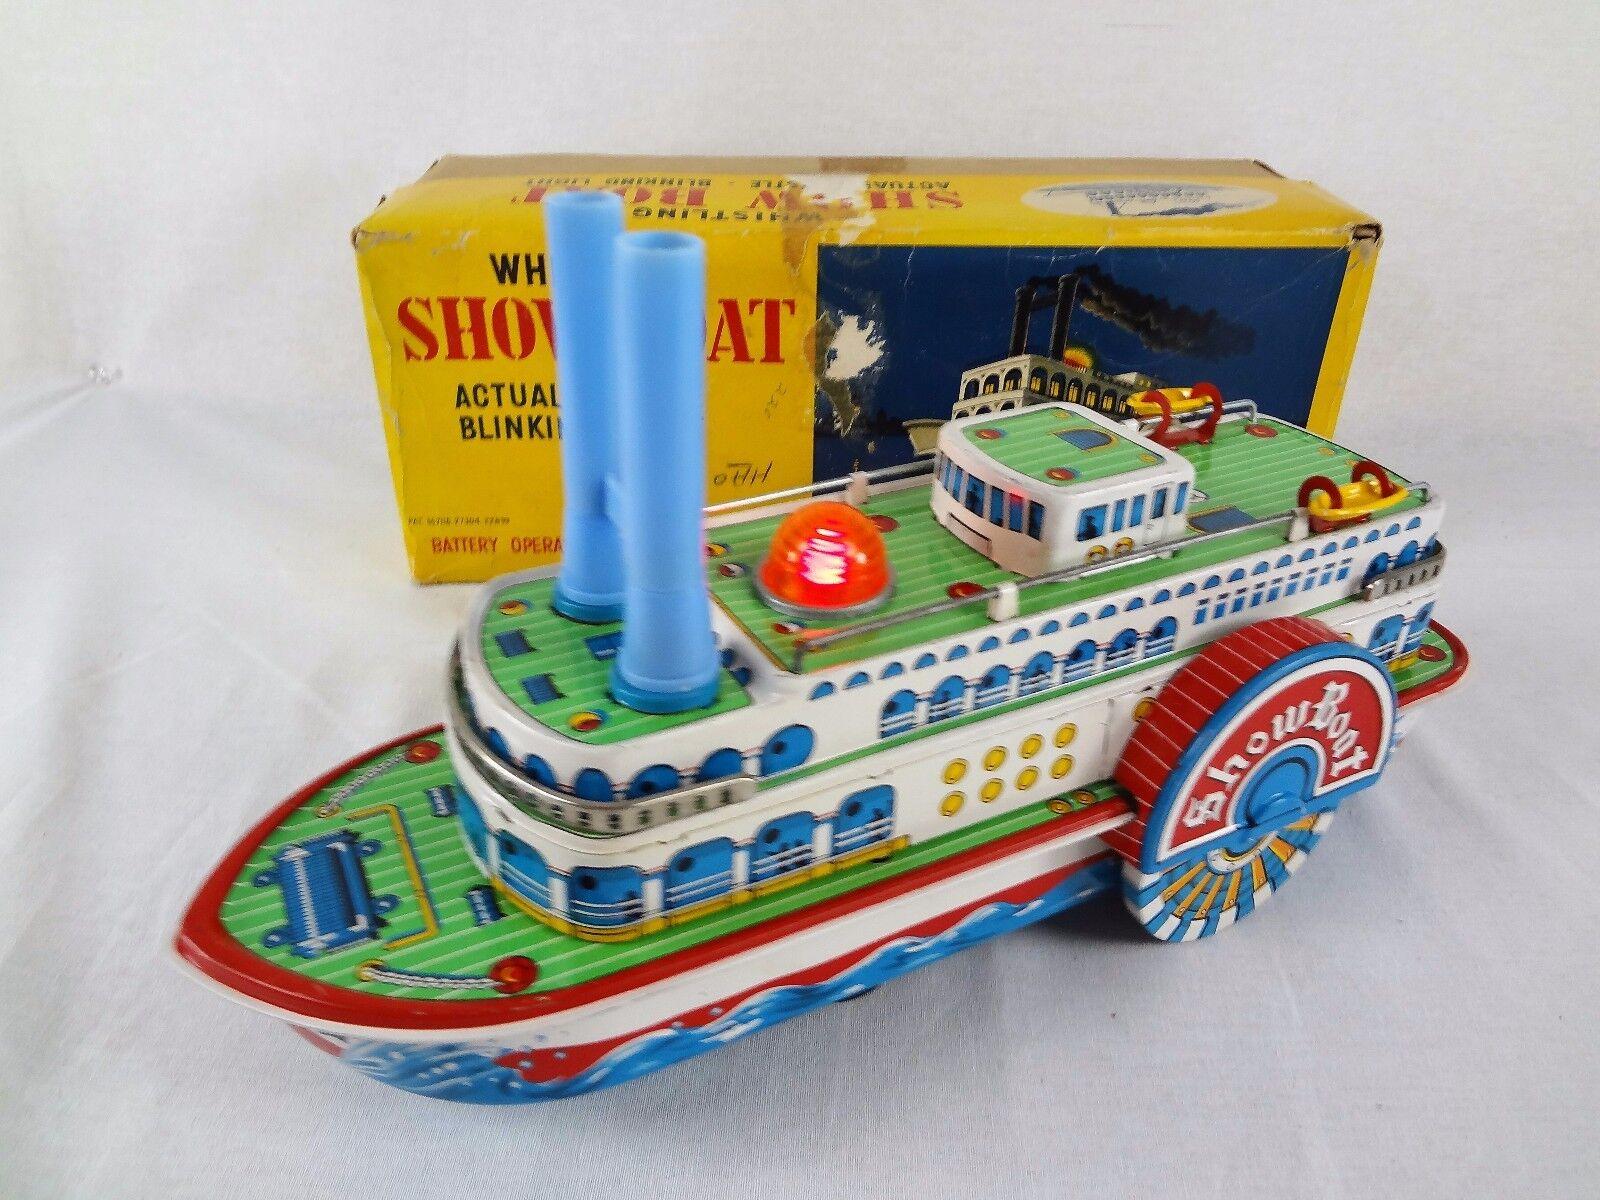 (arbetar) whistling showbåt {65533;C årgång Battery Opererad Tin leksaker {65533; C Modern TM japan